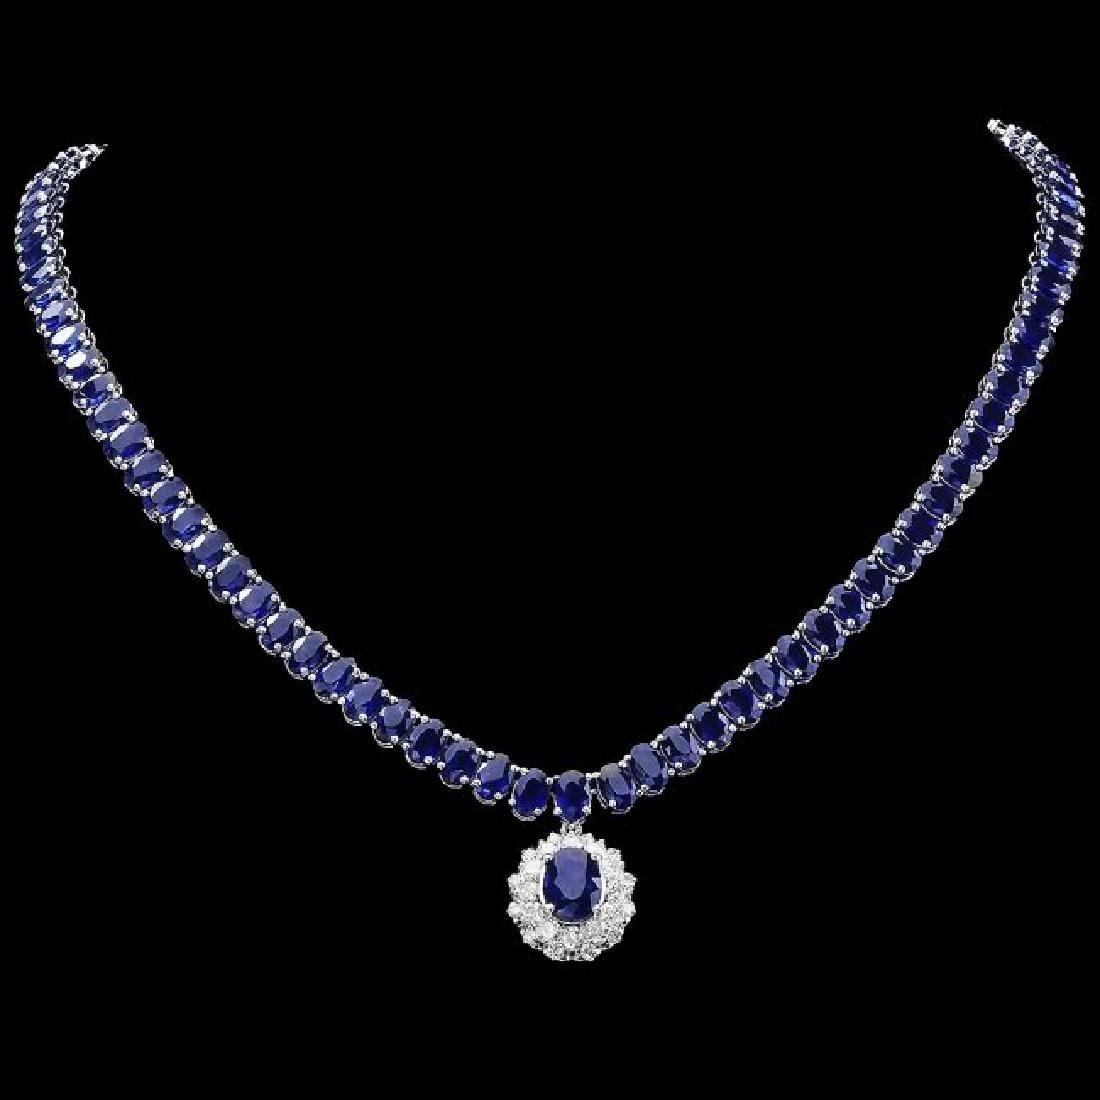 14k Gold 52.5ct Sapphire 1.50ct Diamond Necklace